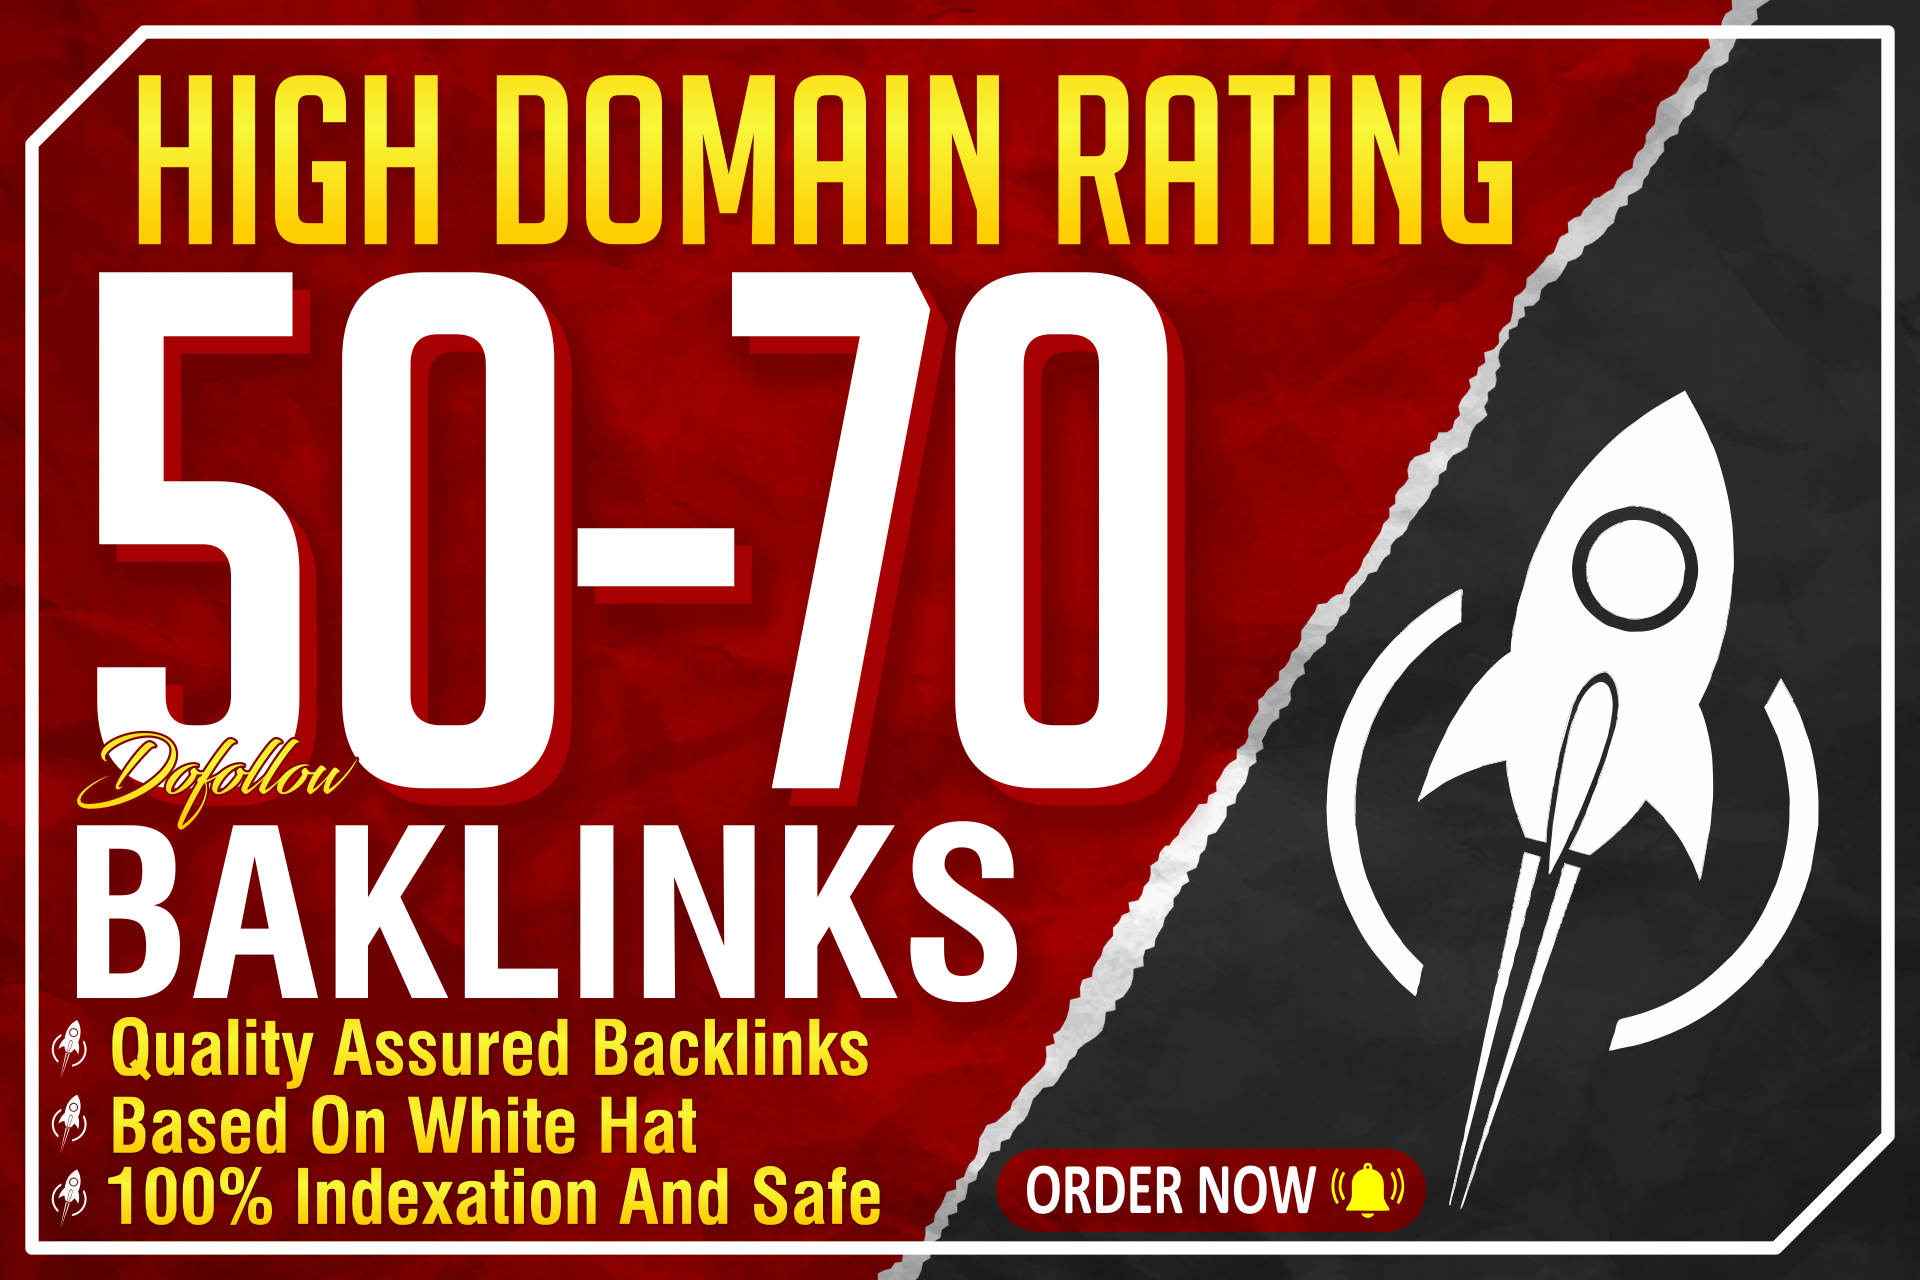 Get 100 high domain rating DR 50 plus dofollow backlinks